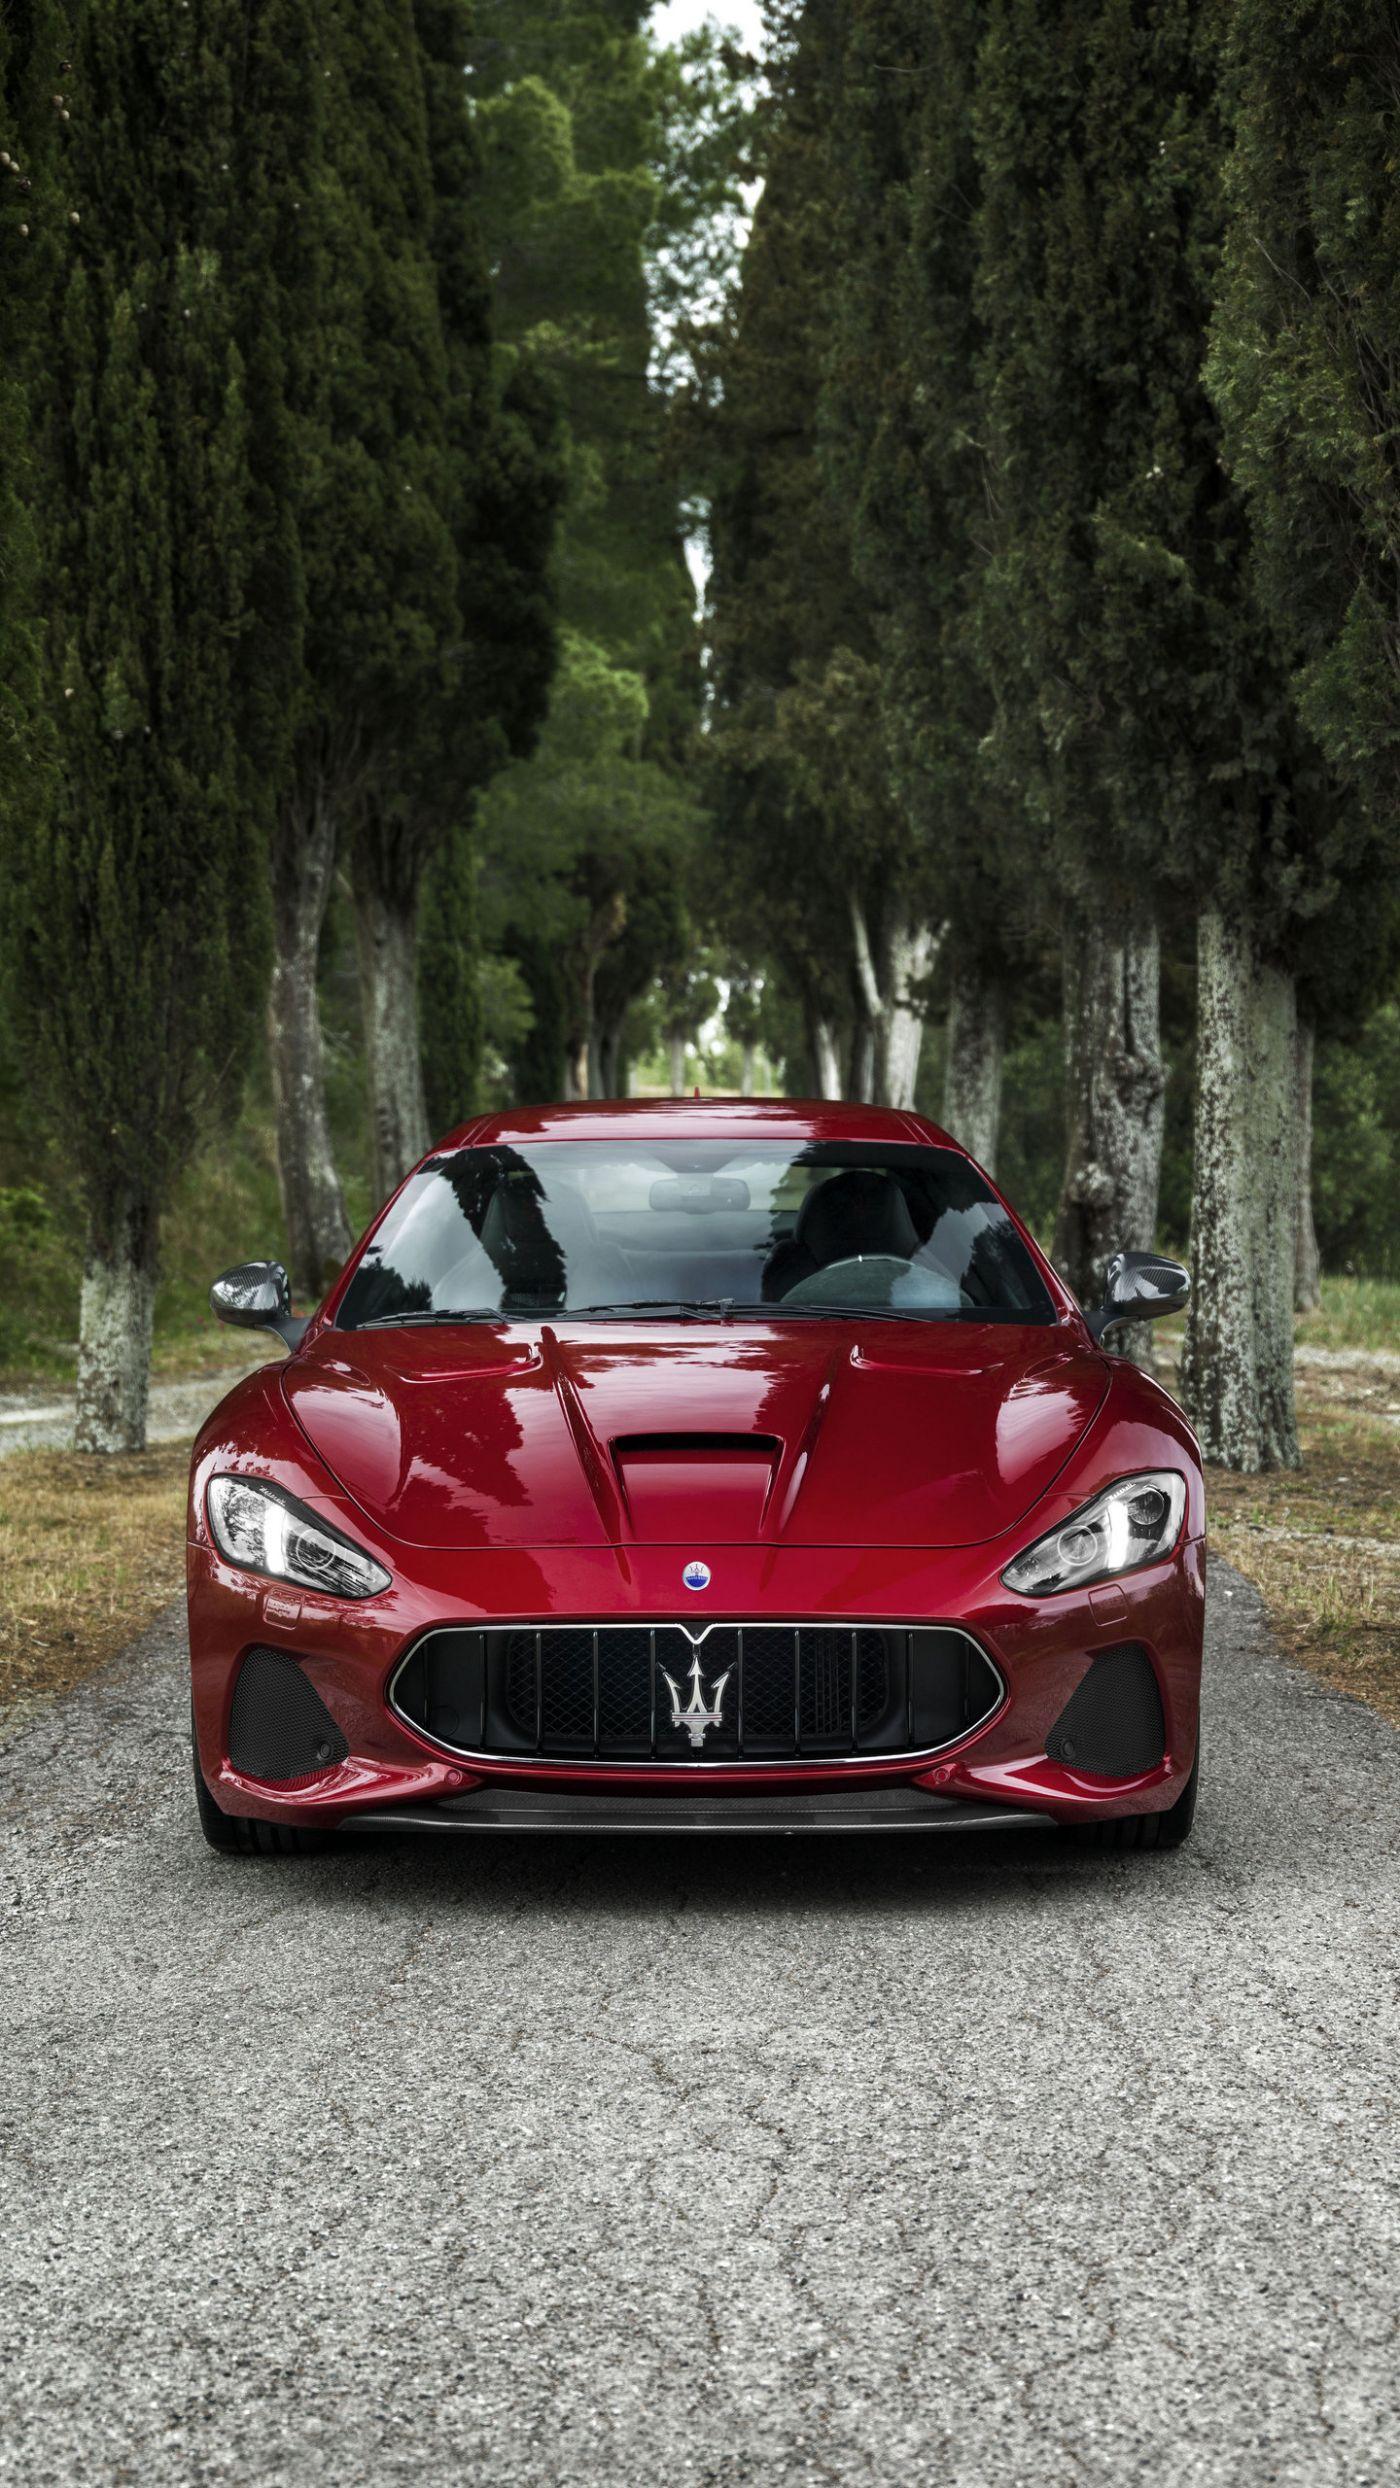 2020 Maserati GranTurismo - A timeless Italian GT ...